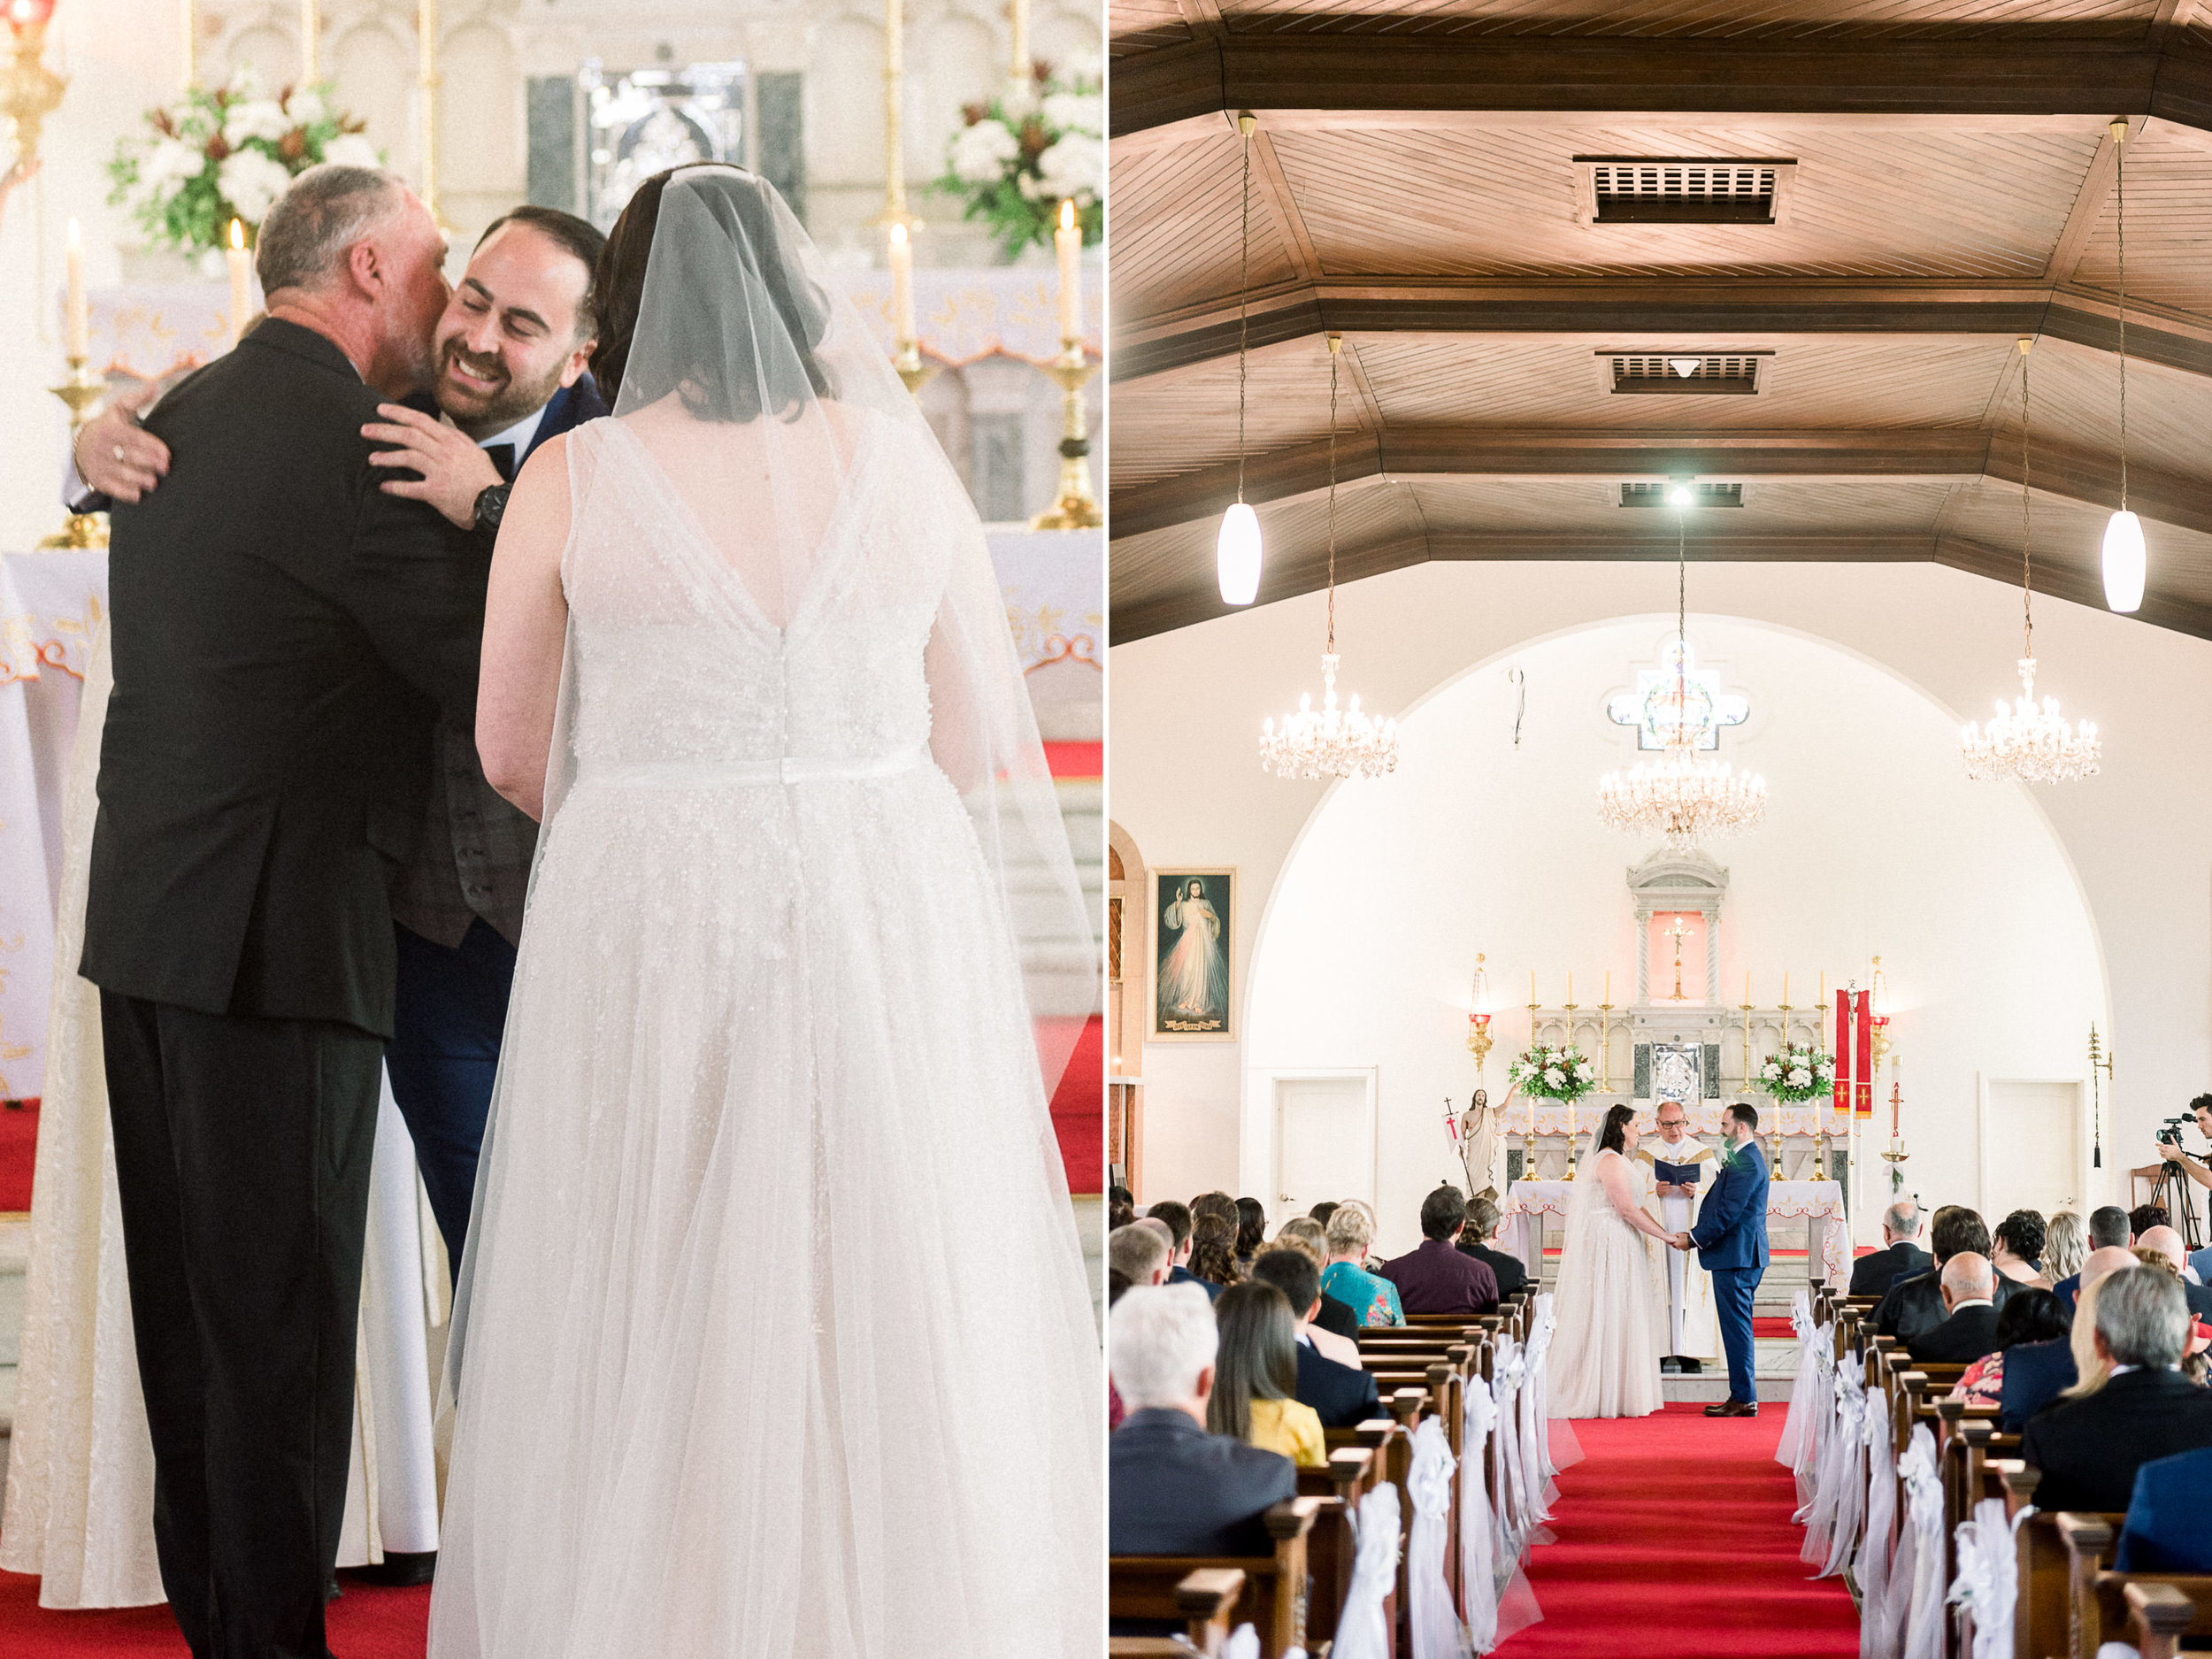 brisbane-city-wedding-church-ceremony-wedding-6.jpg